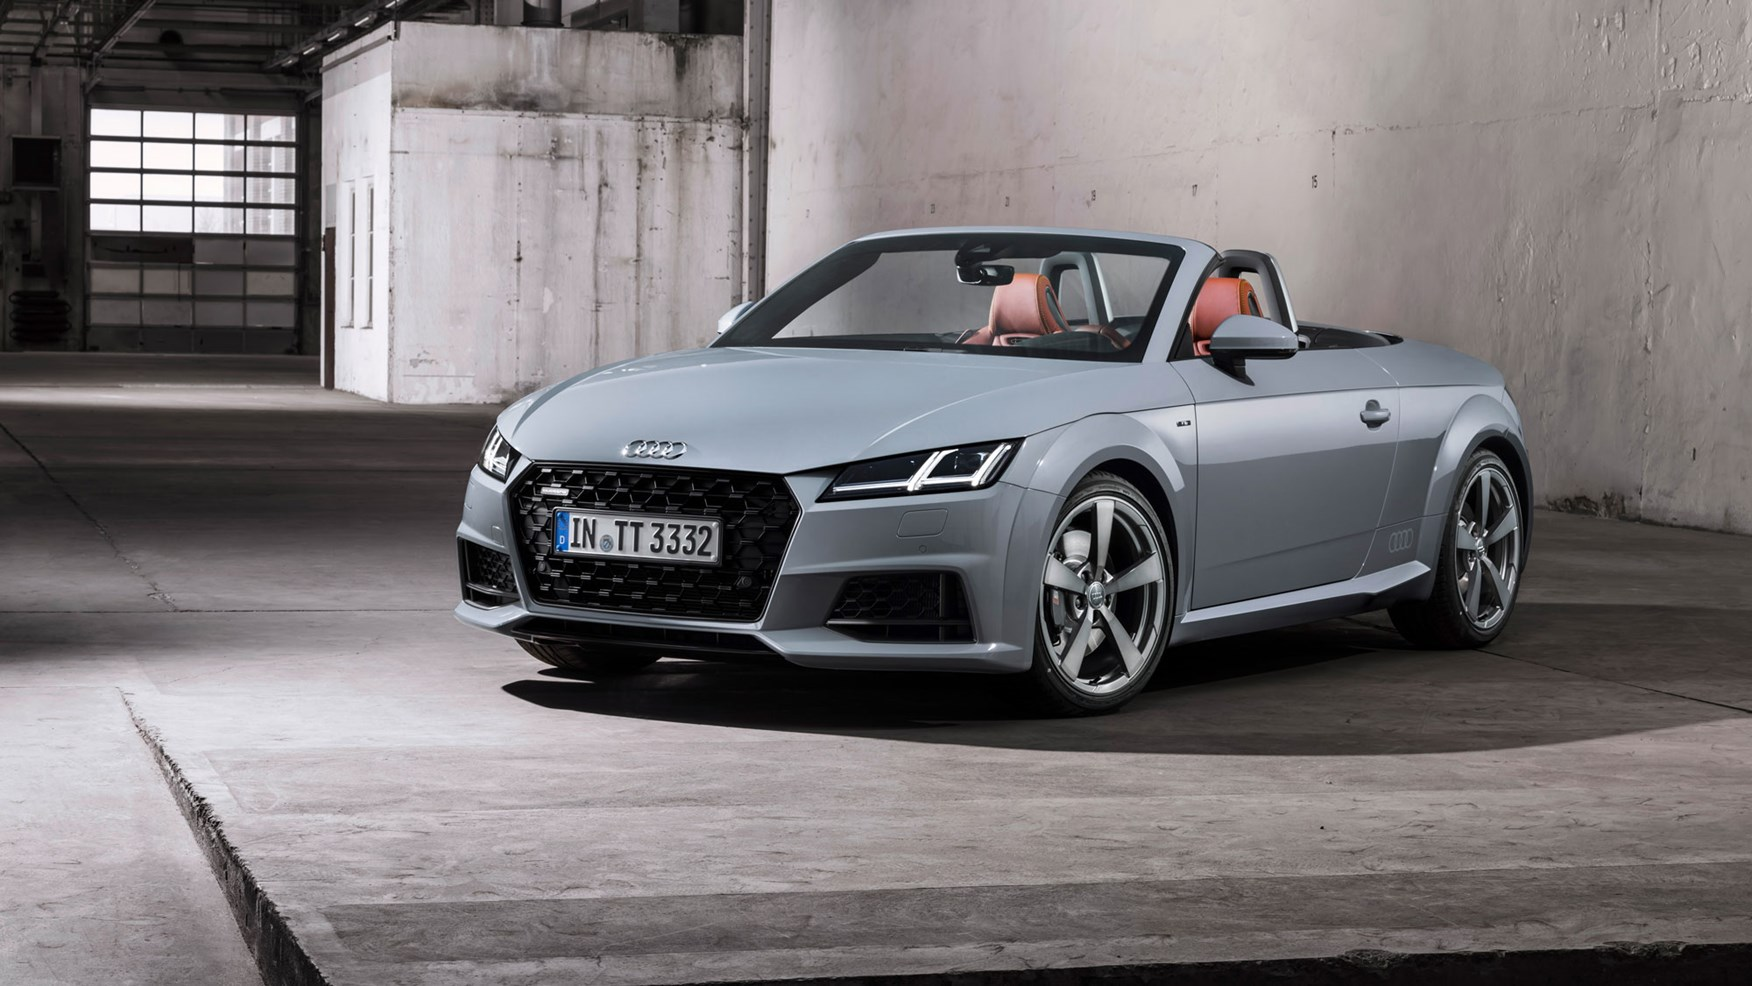 Kekurangan Audi Tt 2019 Review